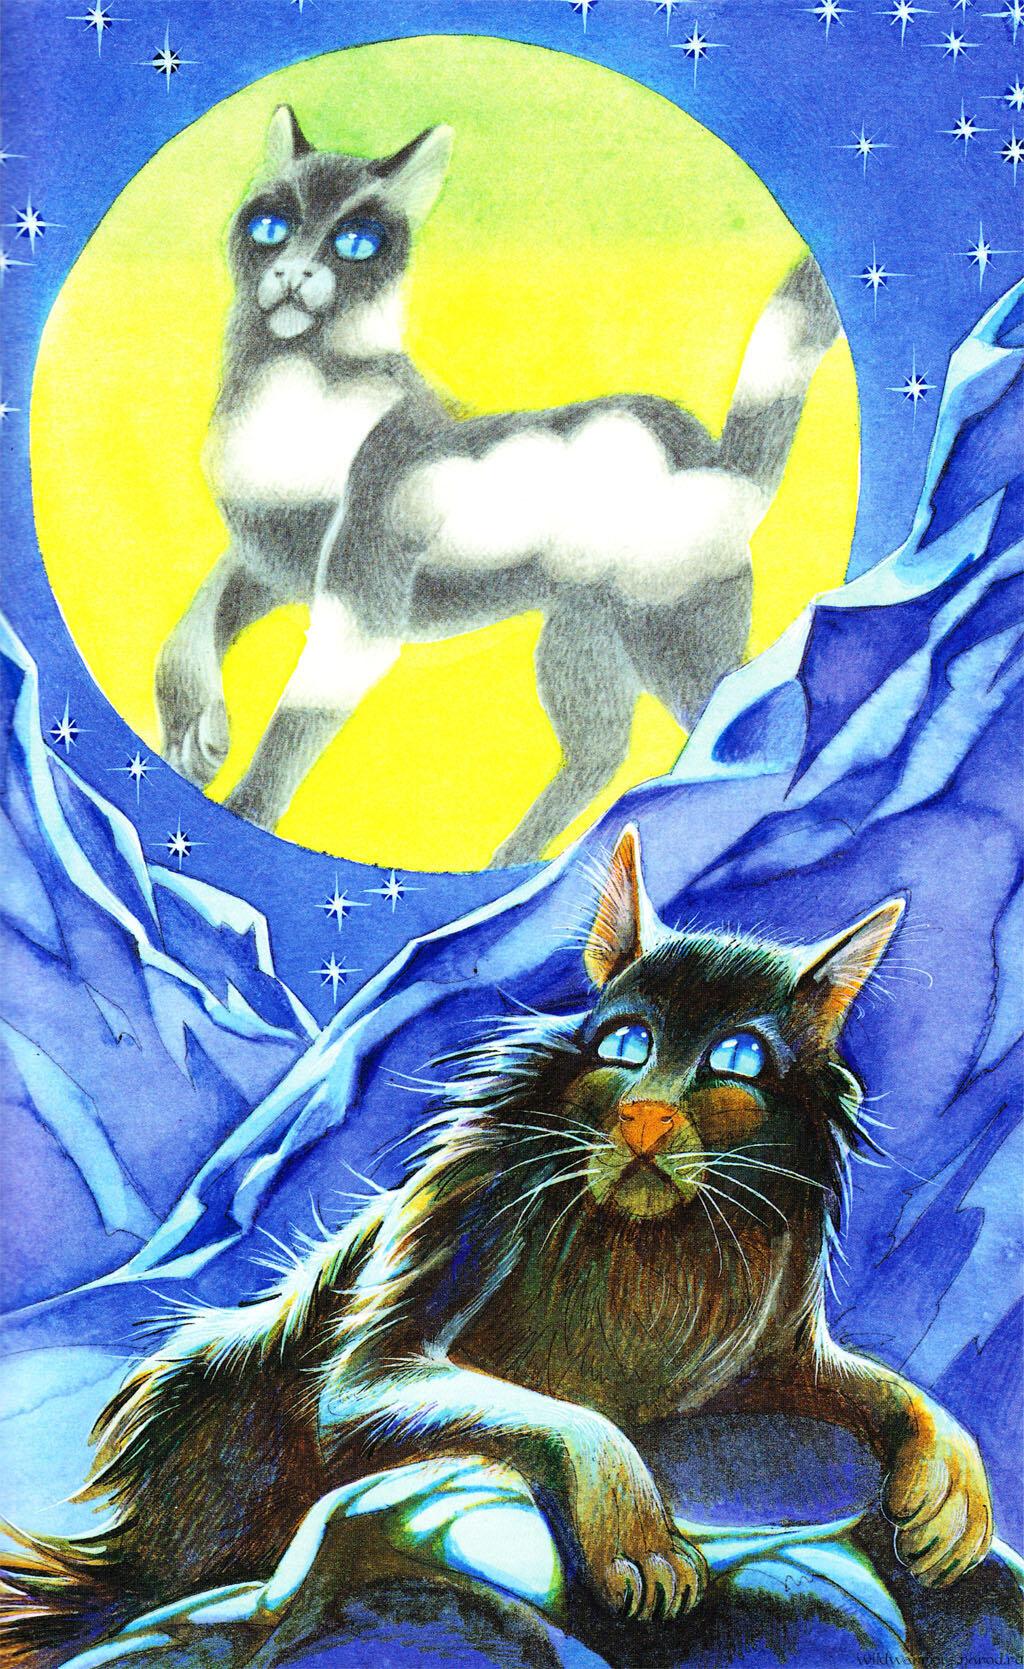 коньяк, коты-воители тучезвезд картинки объектив